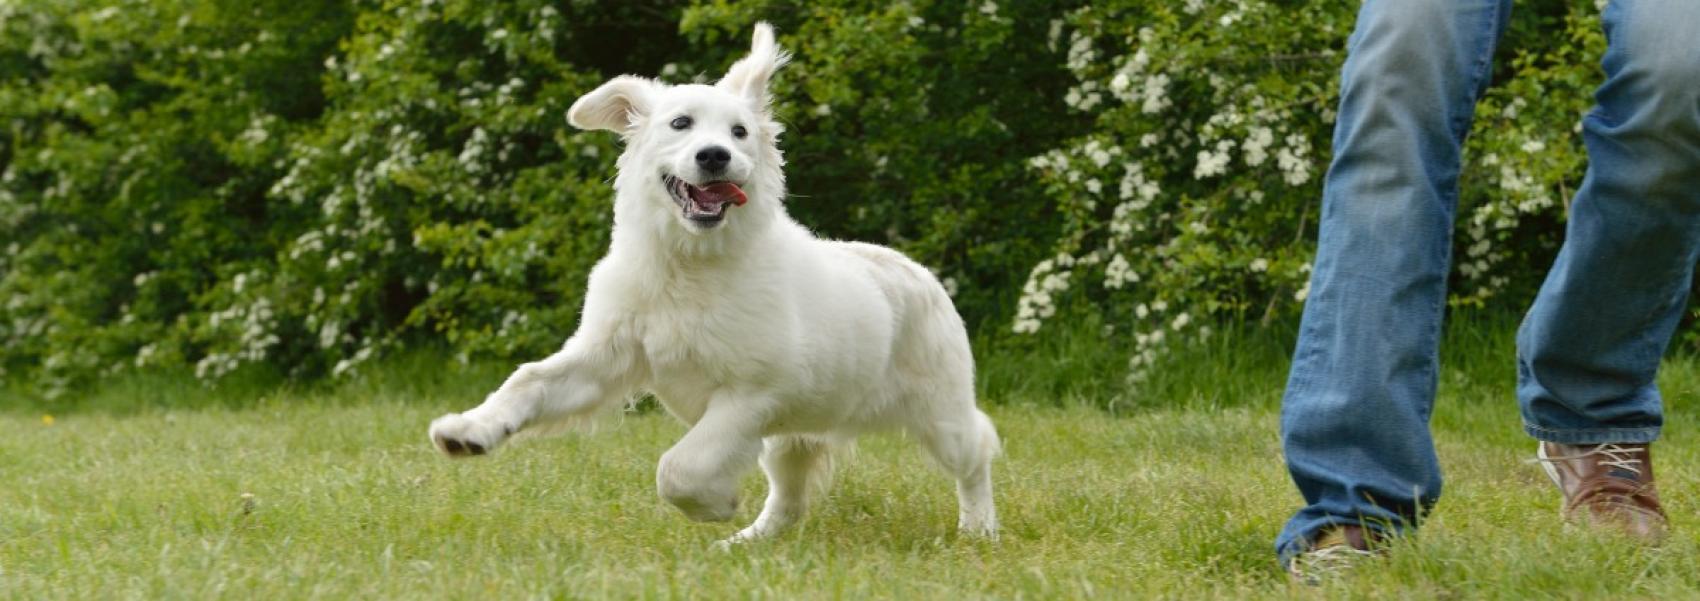 hondenzone in Uitlegger